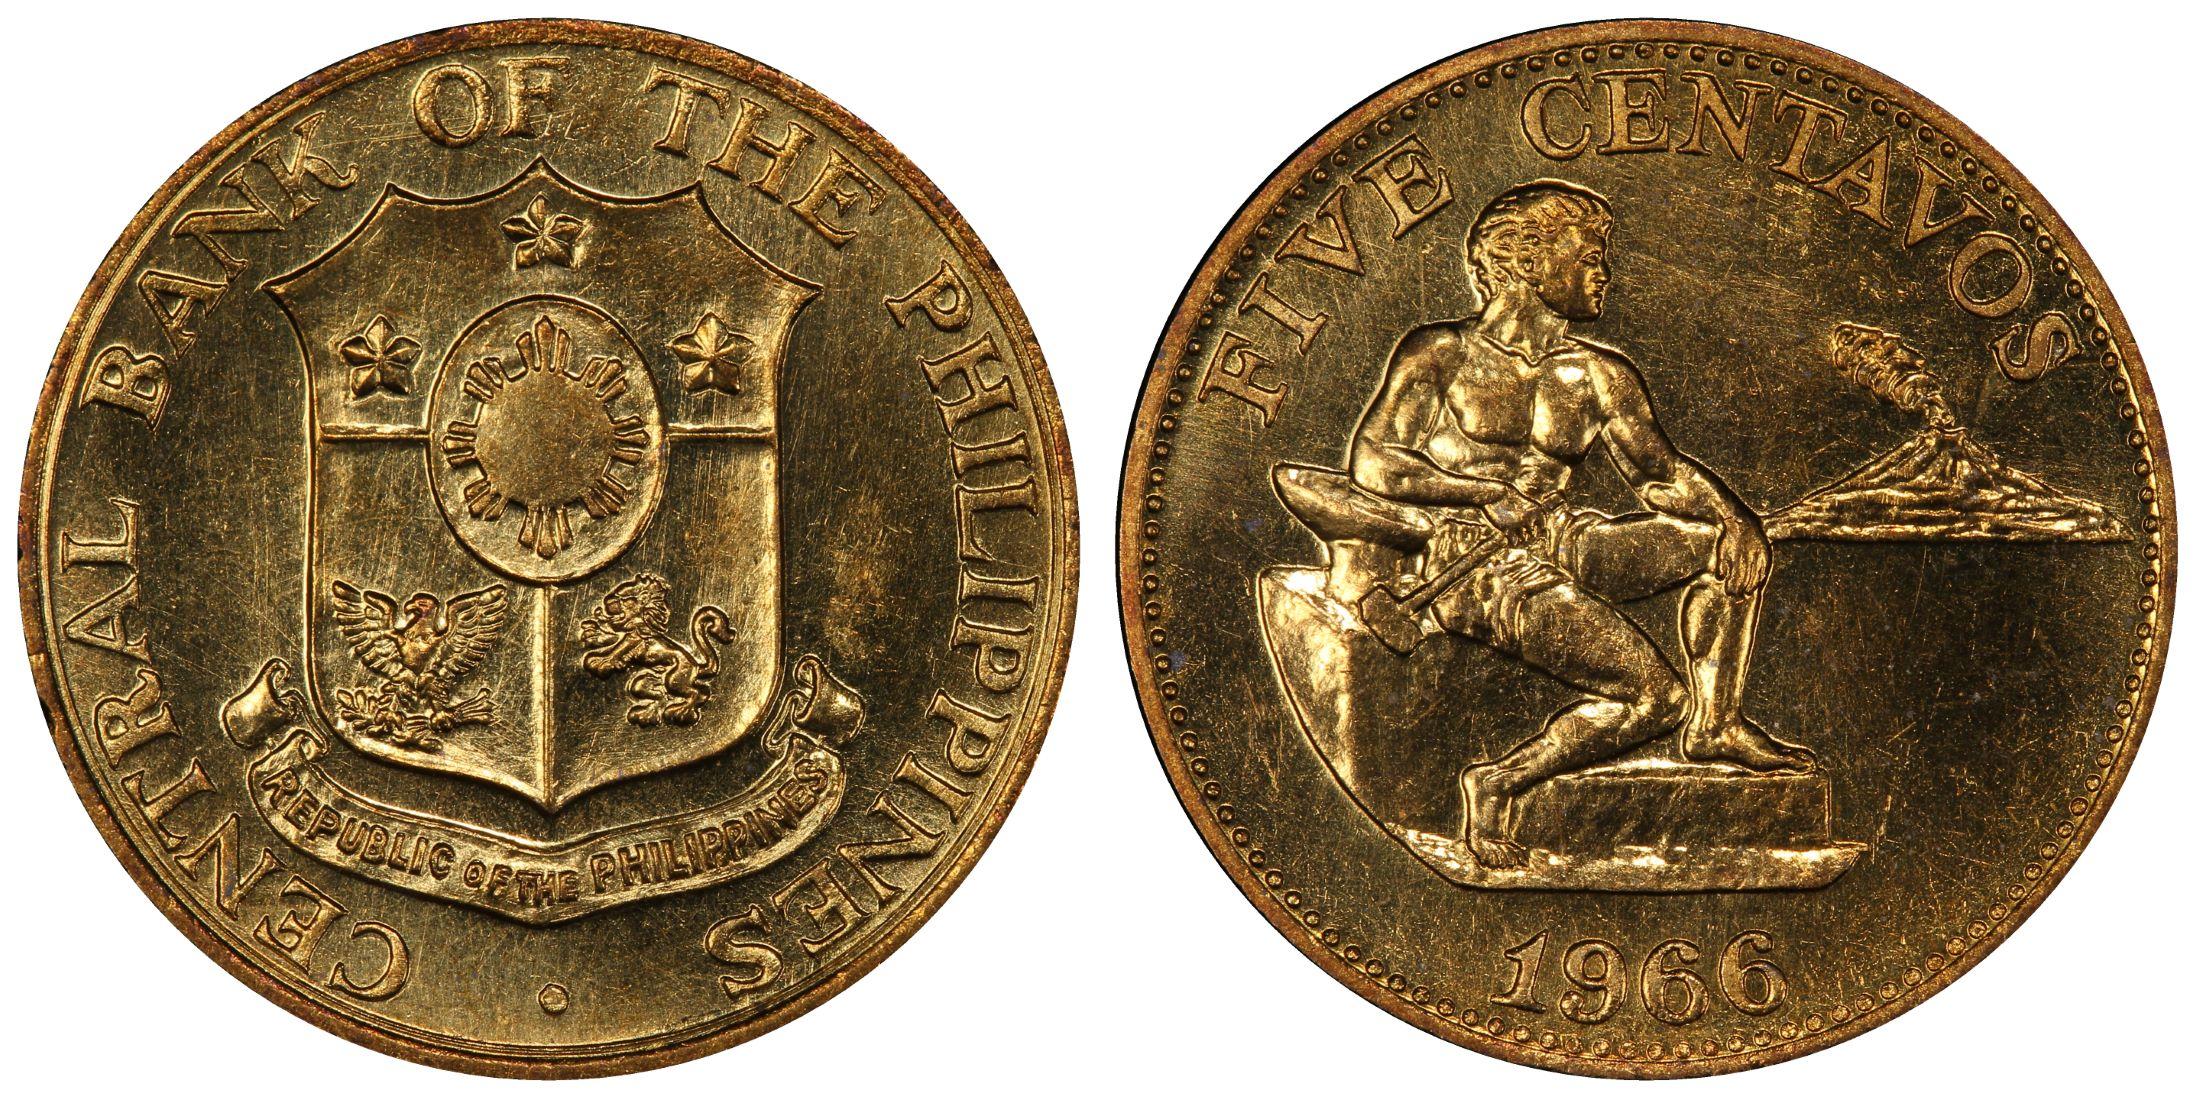 Asia Good Philippines 1966 Brass 5 Centavos Pcgs Sp65 Km187 Rare King's Norton Mint Spec Superior Performance Coins & Paper Money